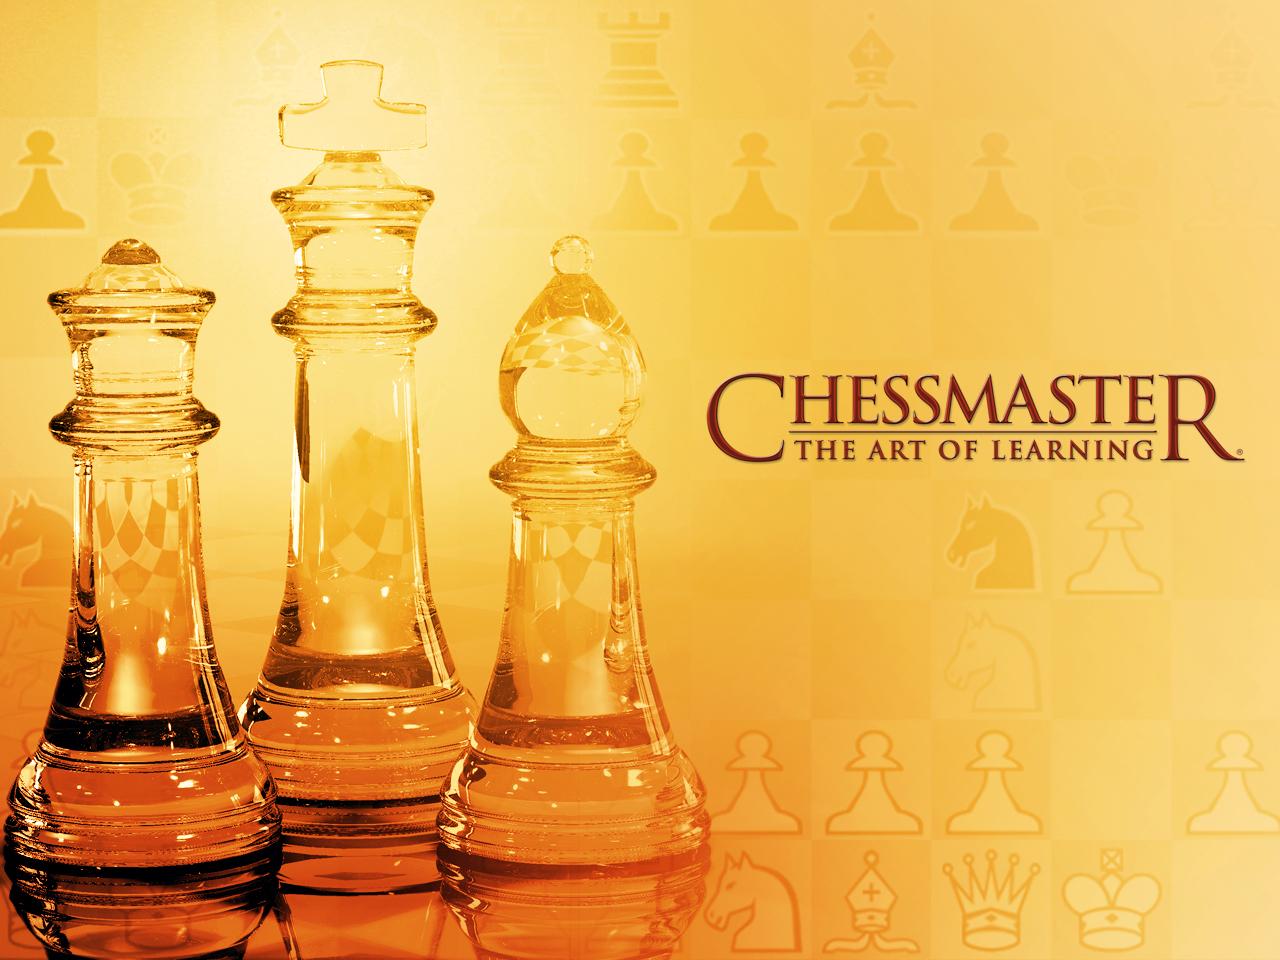 http://2.bp.blogspot.com/-ftF6JEjoud0/TvCs7YYGyTI/AAAAAAAAAHw/KczkIApK-w0/s1600/Chessmaster_11_Wallpaper_2_1280.jpg